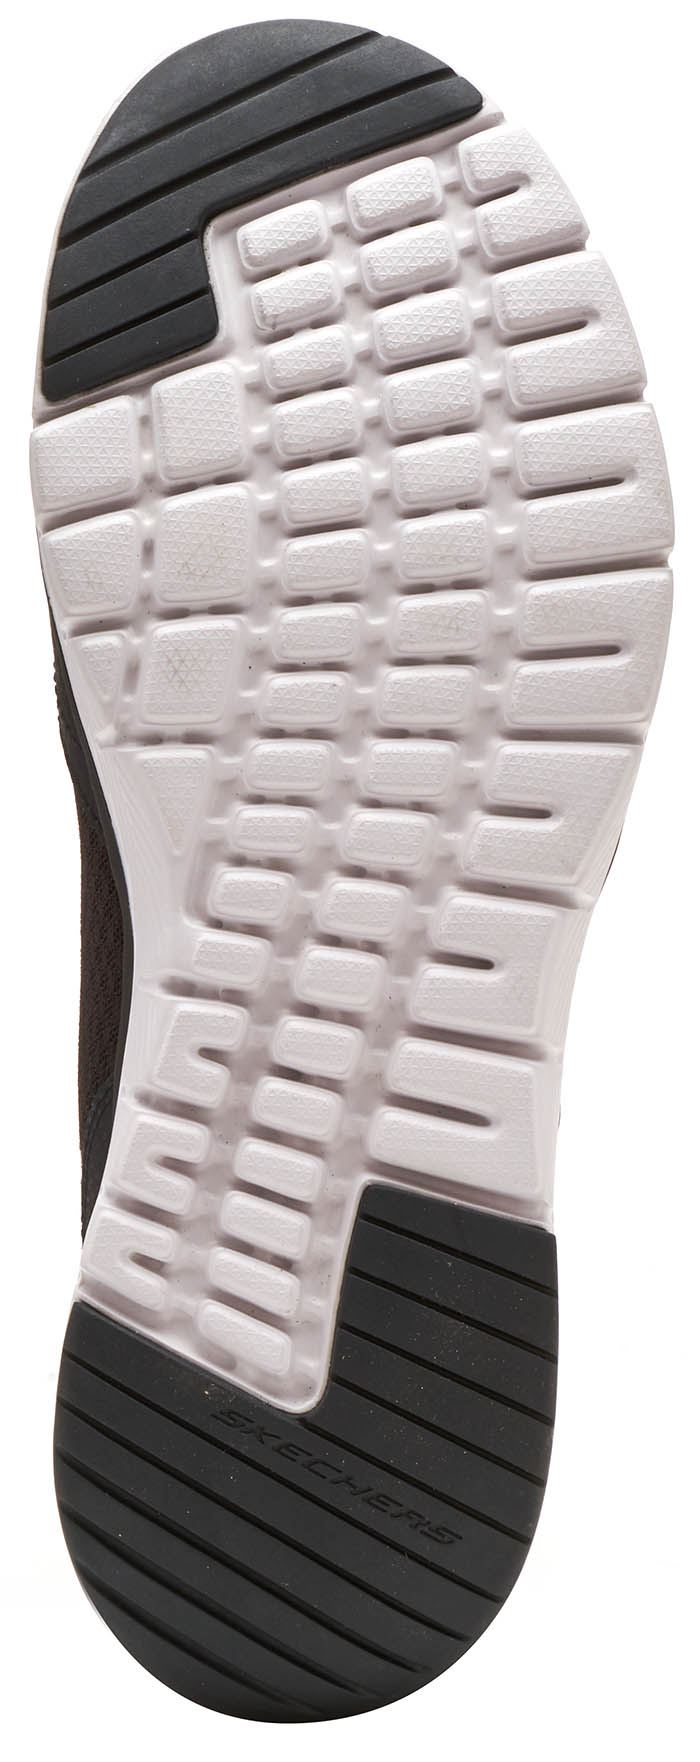 Skechers-FLEX-ADVANTAGE-3-0-con-Cordones-Fitness-Correr-Entrenadores-de-espuma-de-memoria miniatura 13